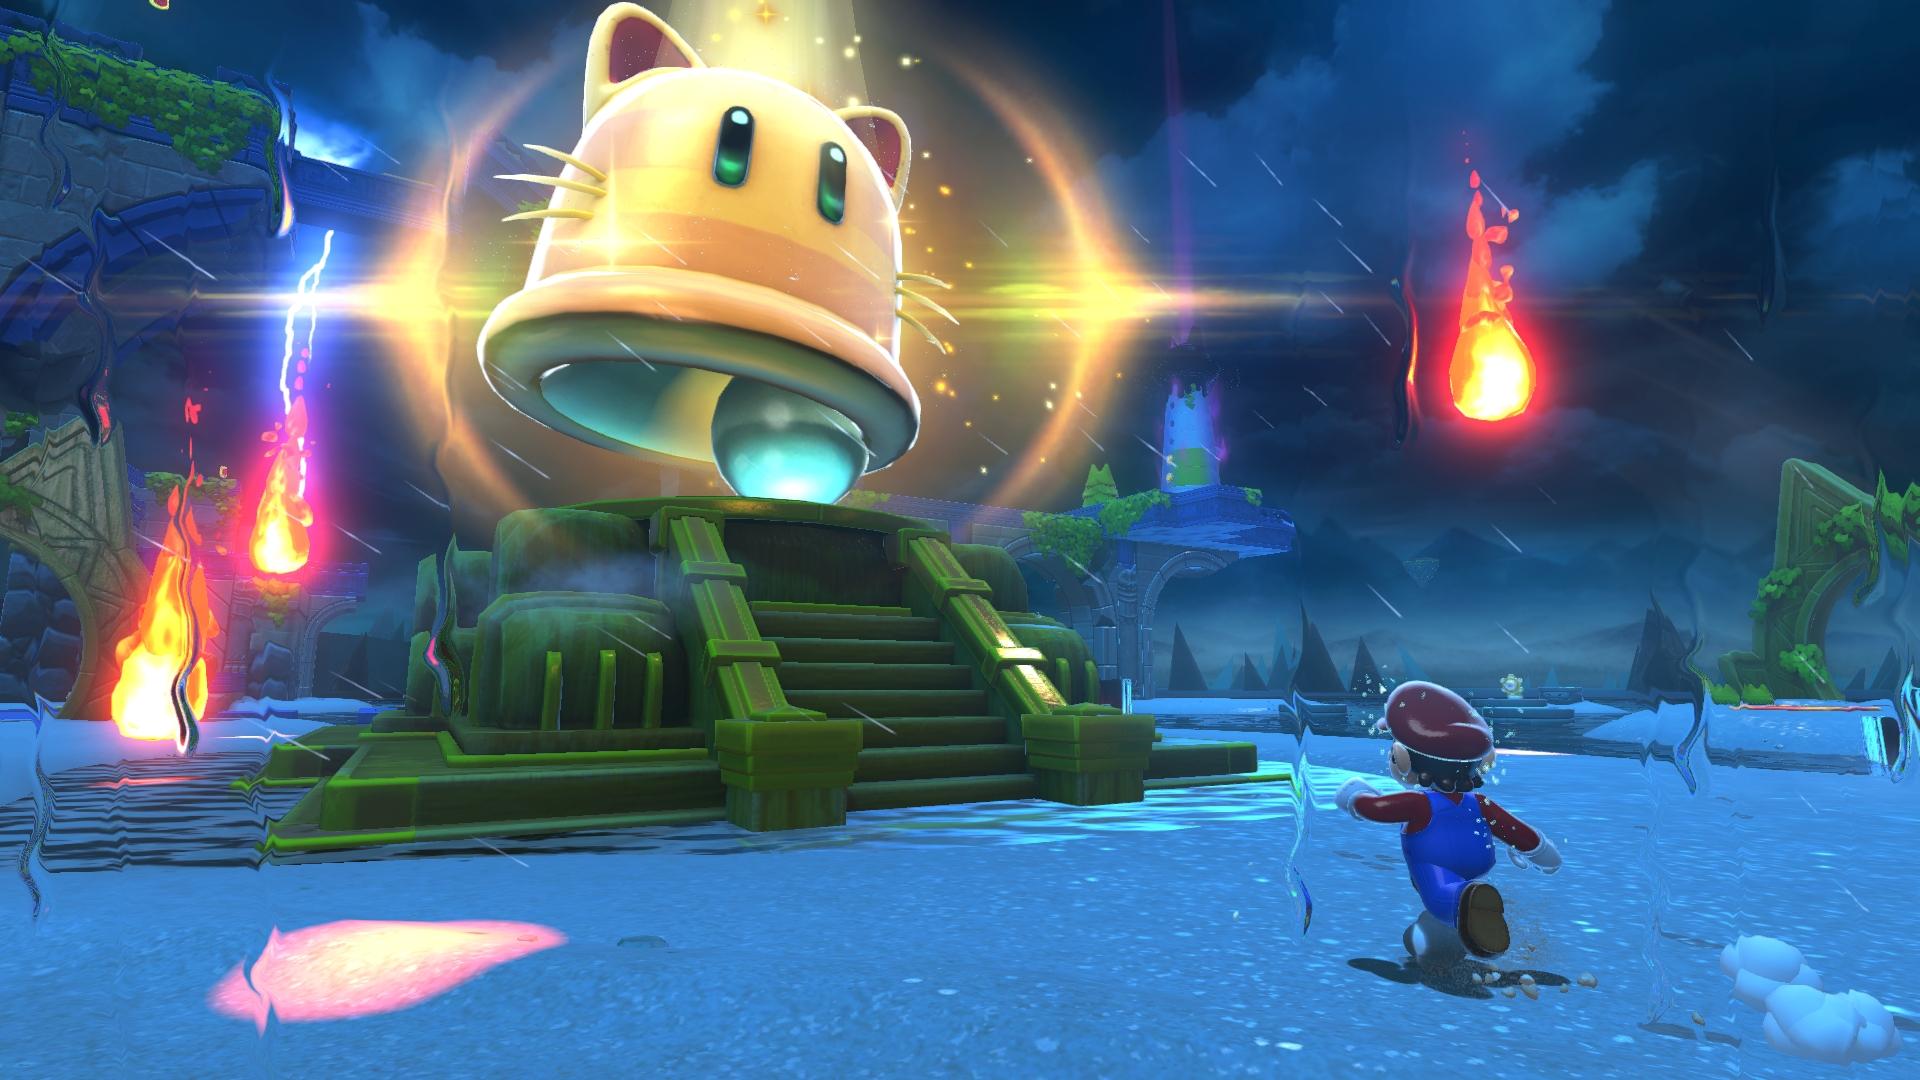 Super-Mario-3D-World-Plus-Bowsers-Fury_2021_01-12-21_002.jpg